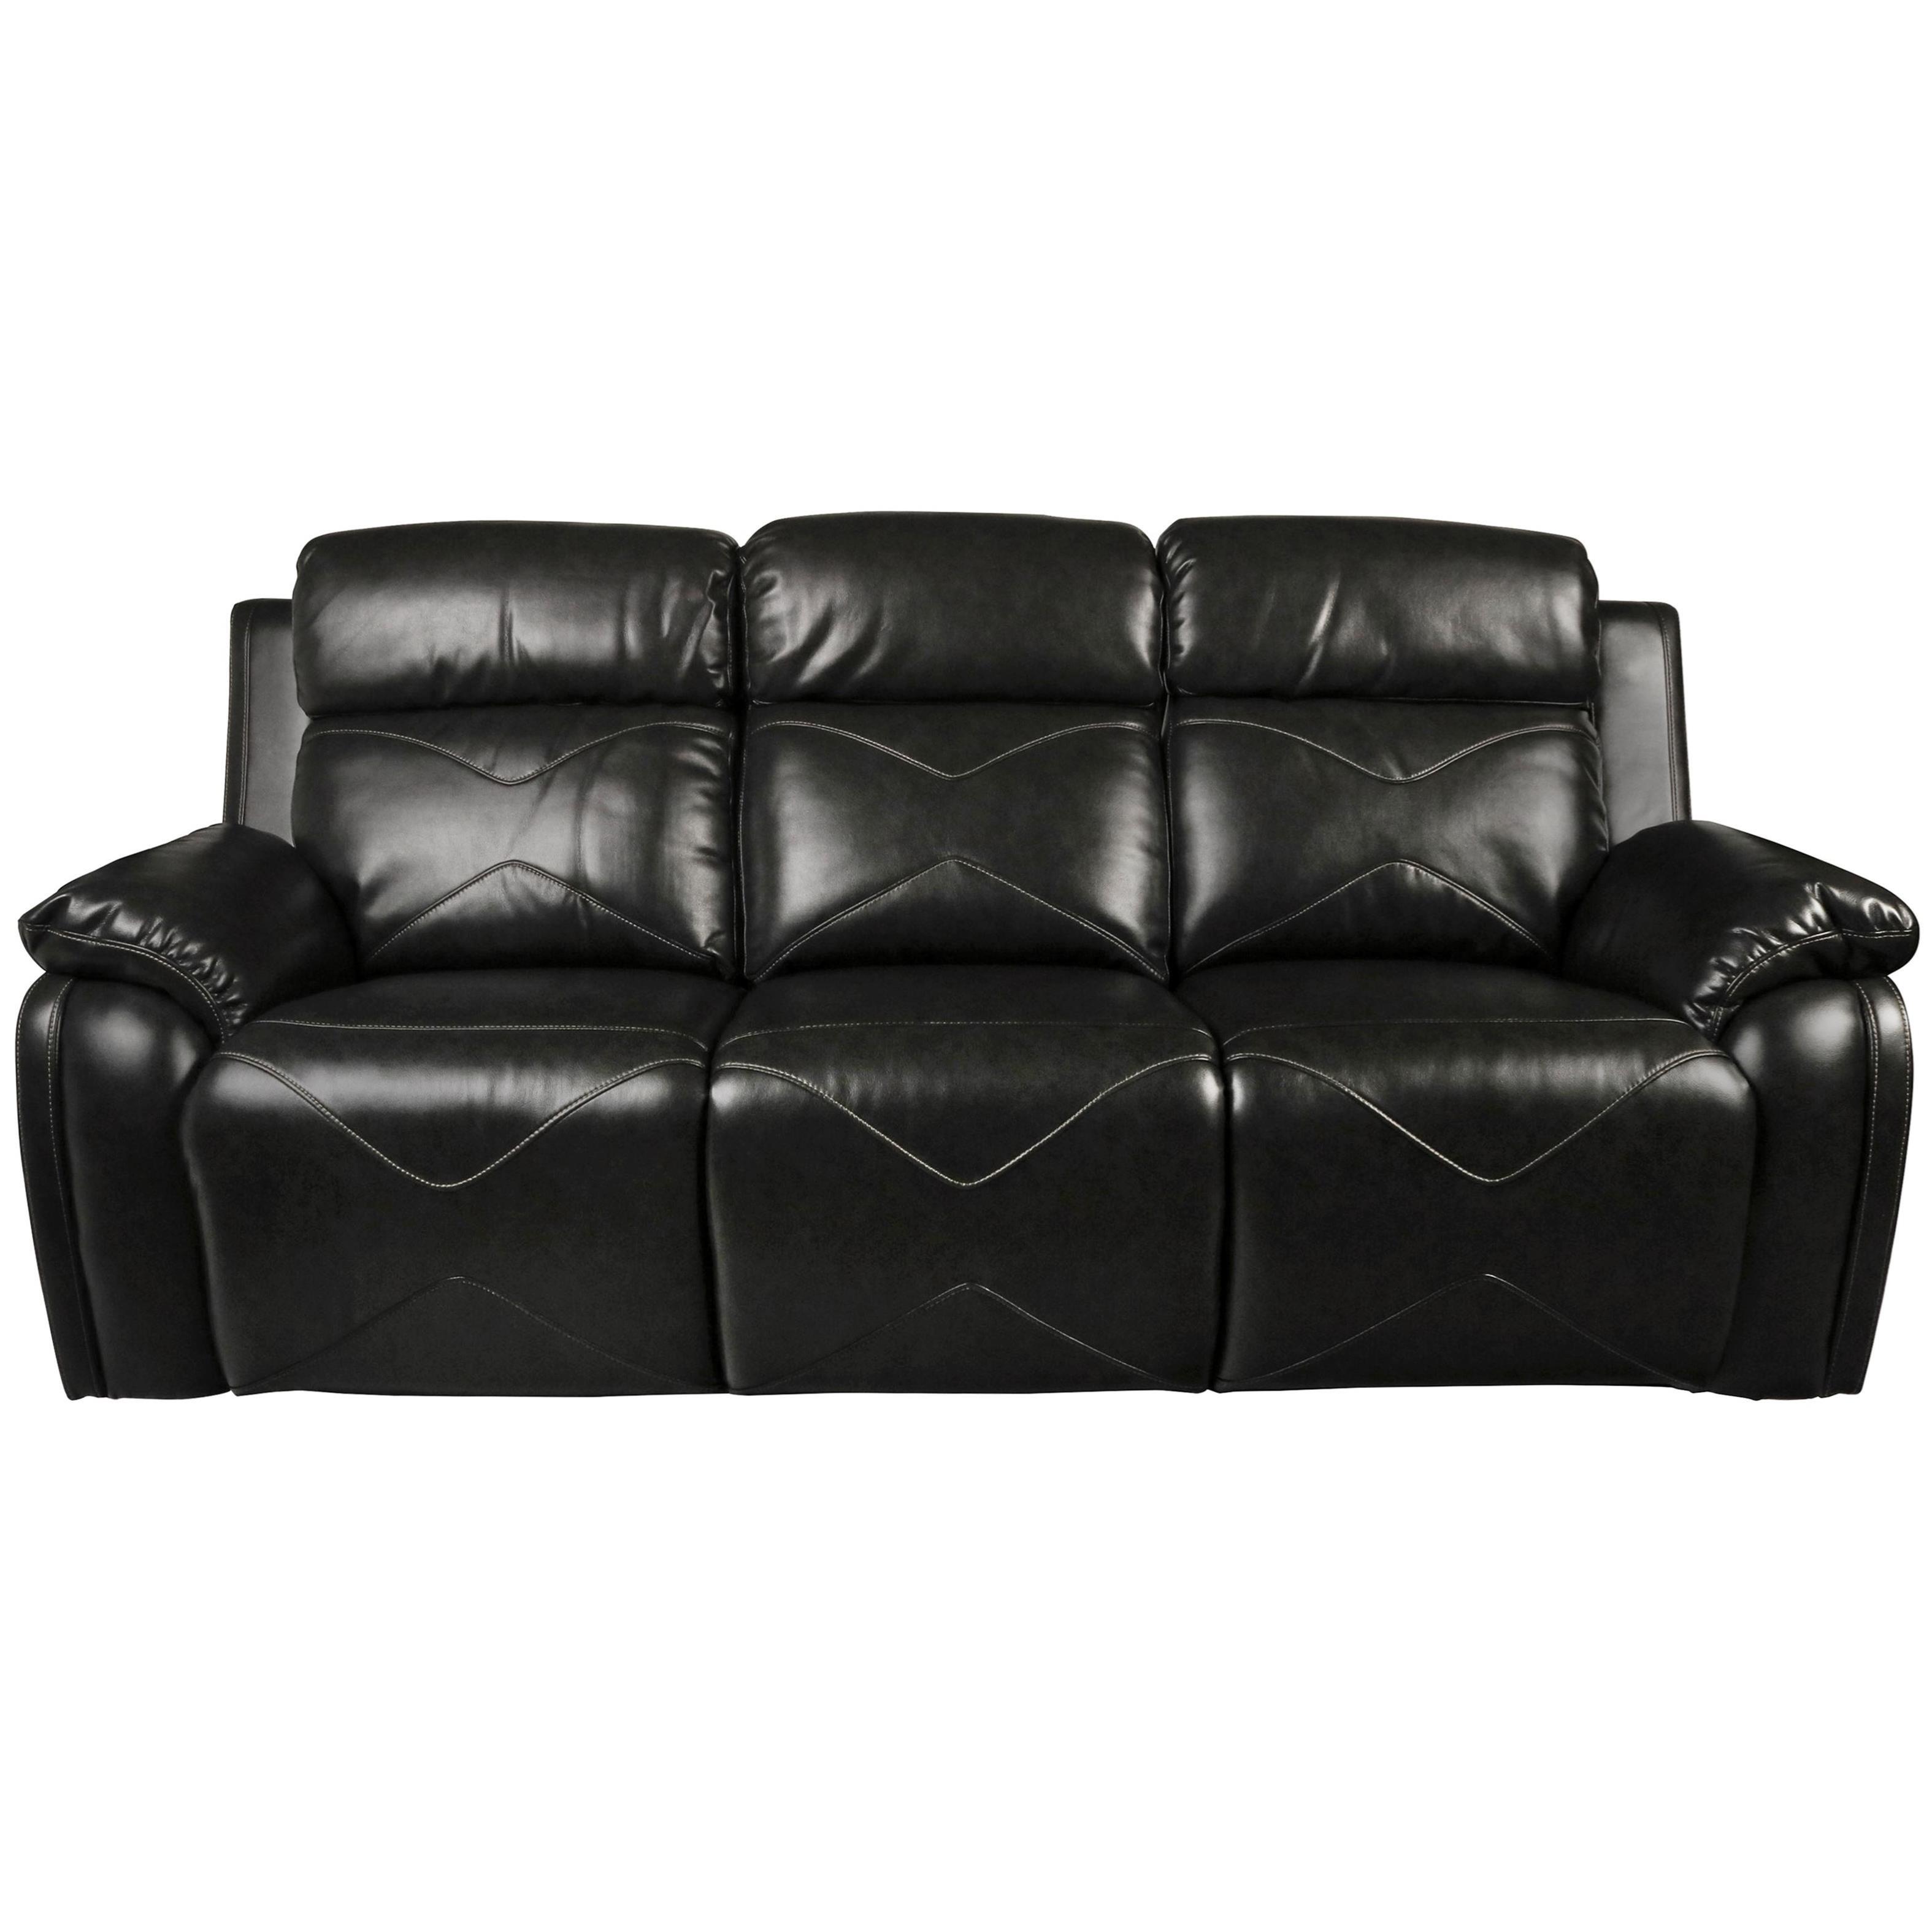 ... New Classic VigoPower Reclining Sofa With Power Headrest ...